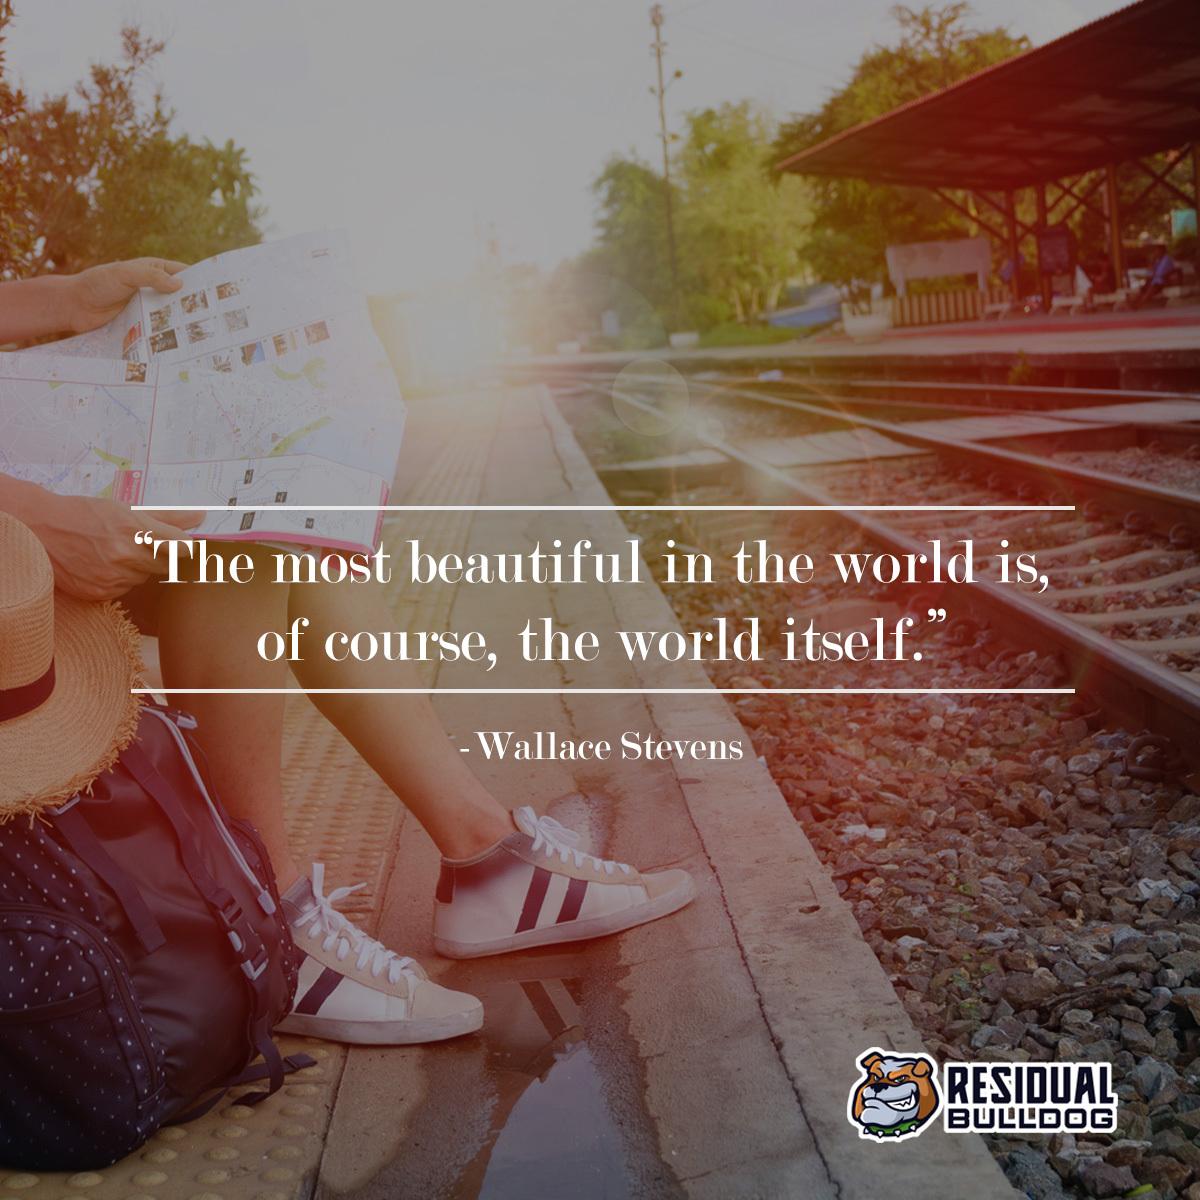 """The most beautiful in the world is, of course, the world itself."" - Wallace Stevens  . . . #socialmediamarketing #lifestyle #travel #inspiration #laptoplifestyle #internetbusiness #homebusiness #makemoneywhileyousleep #lifegoalspic.twitter.com/a12jeDAv7Q"